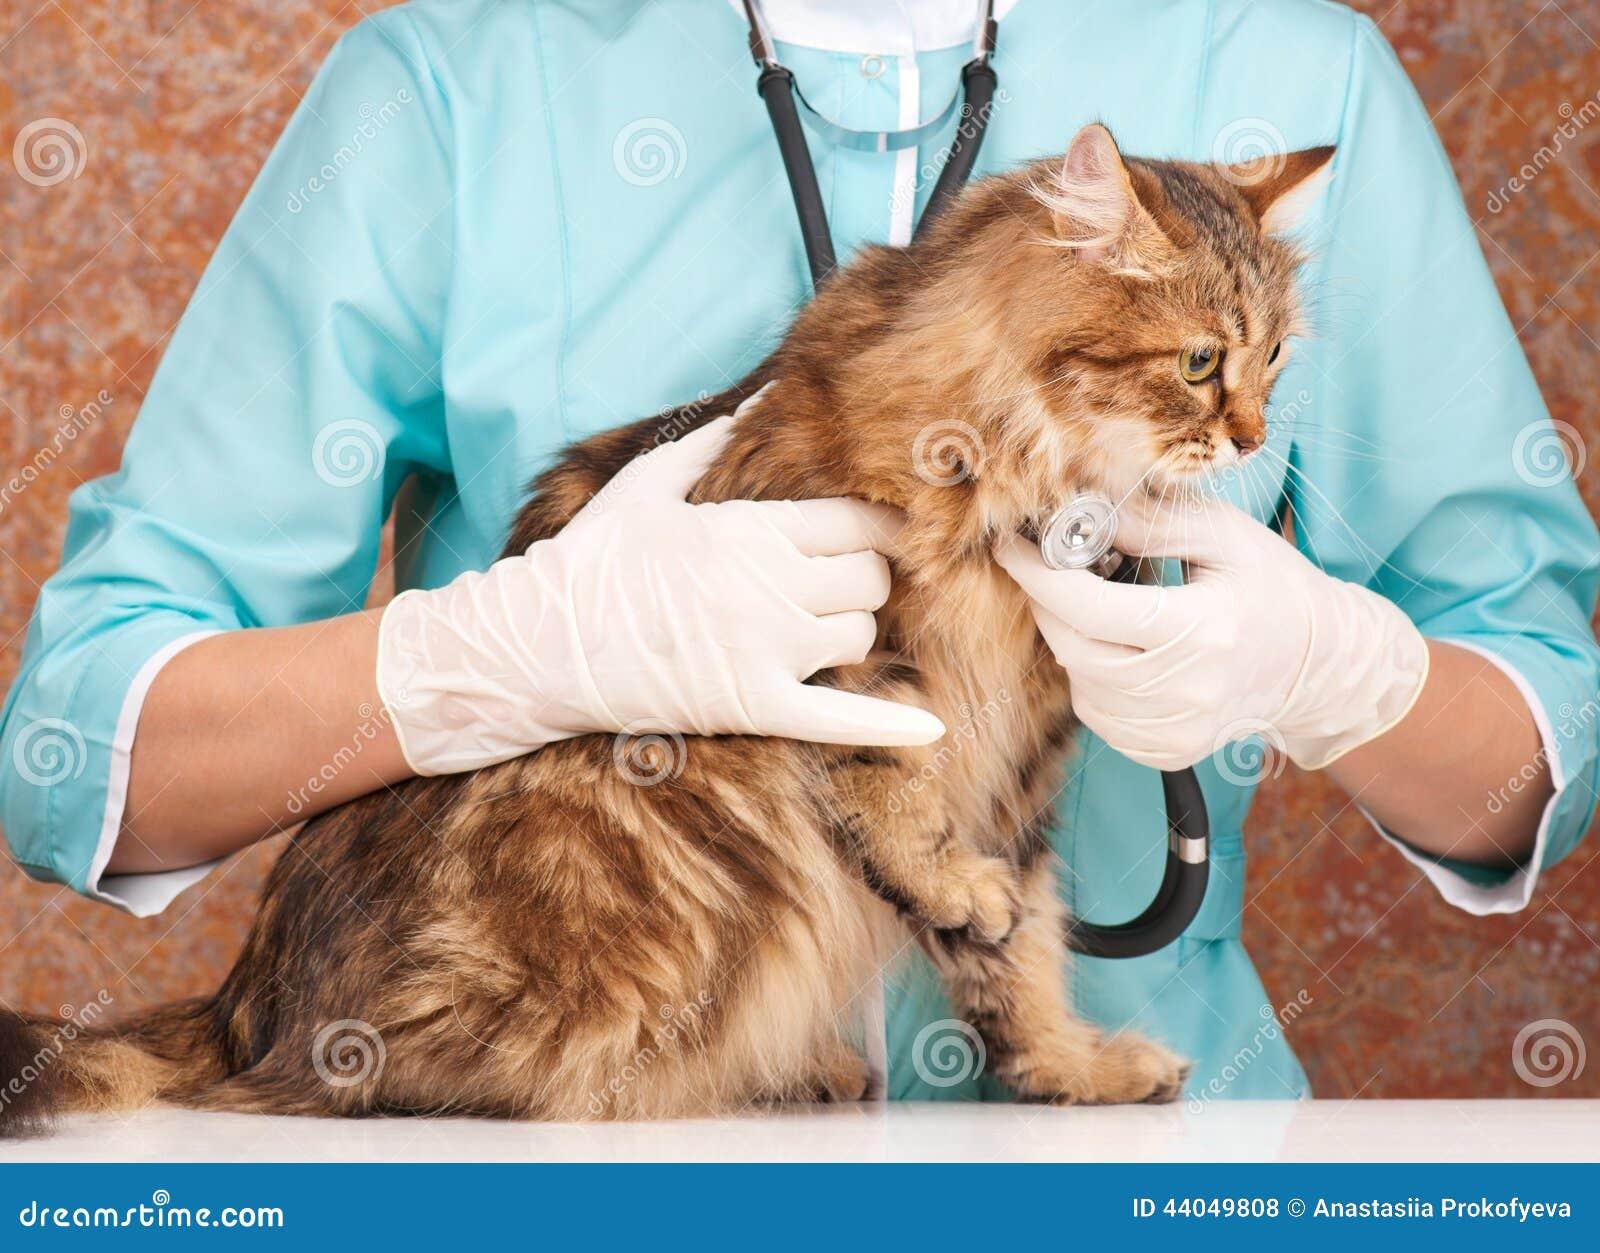 Veterinary survey